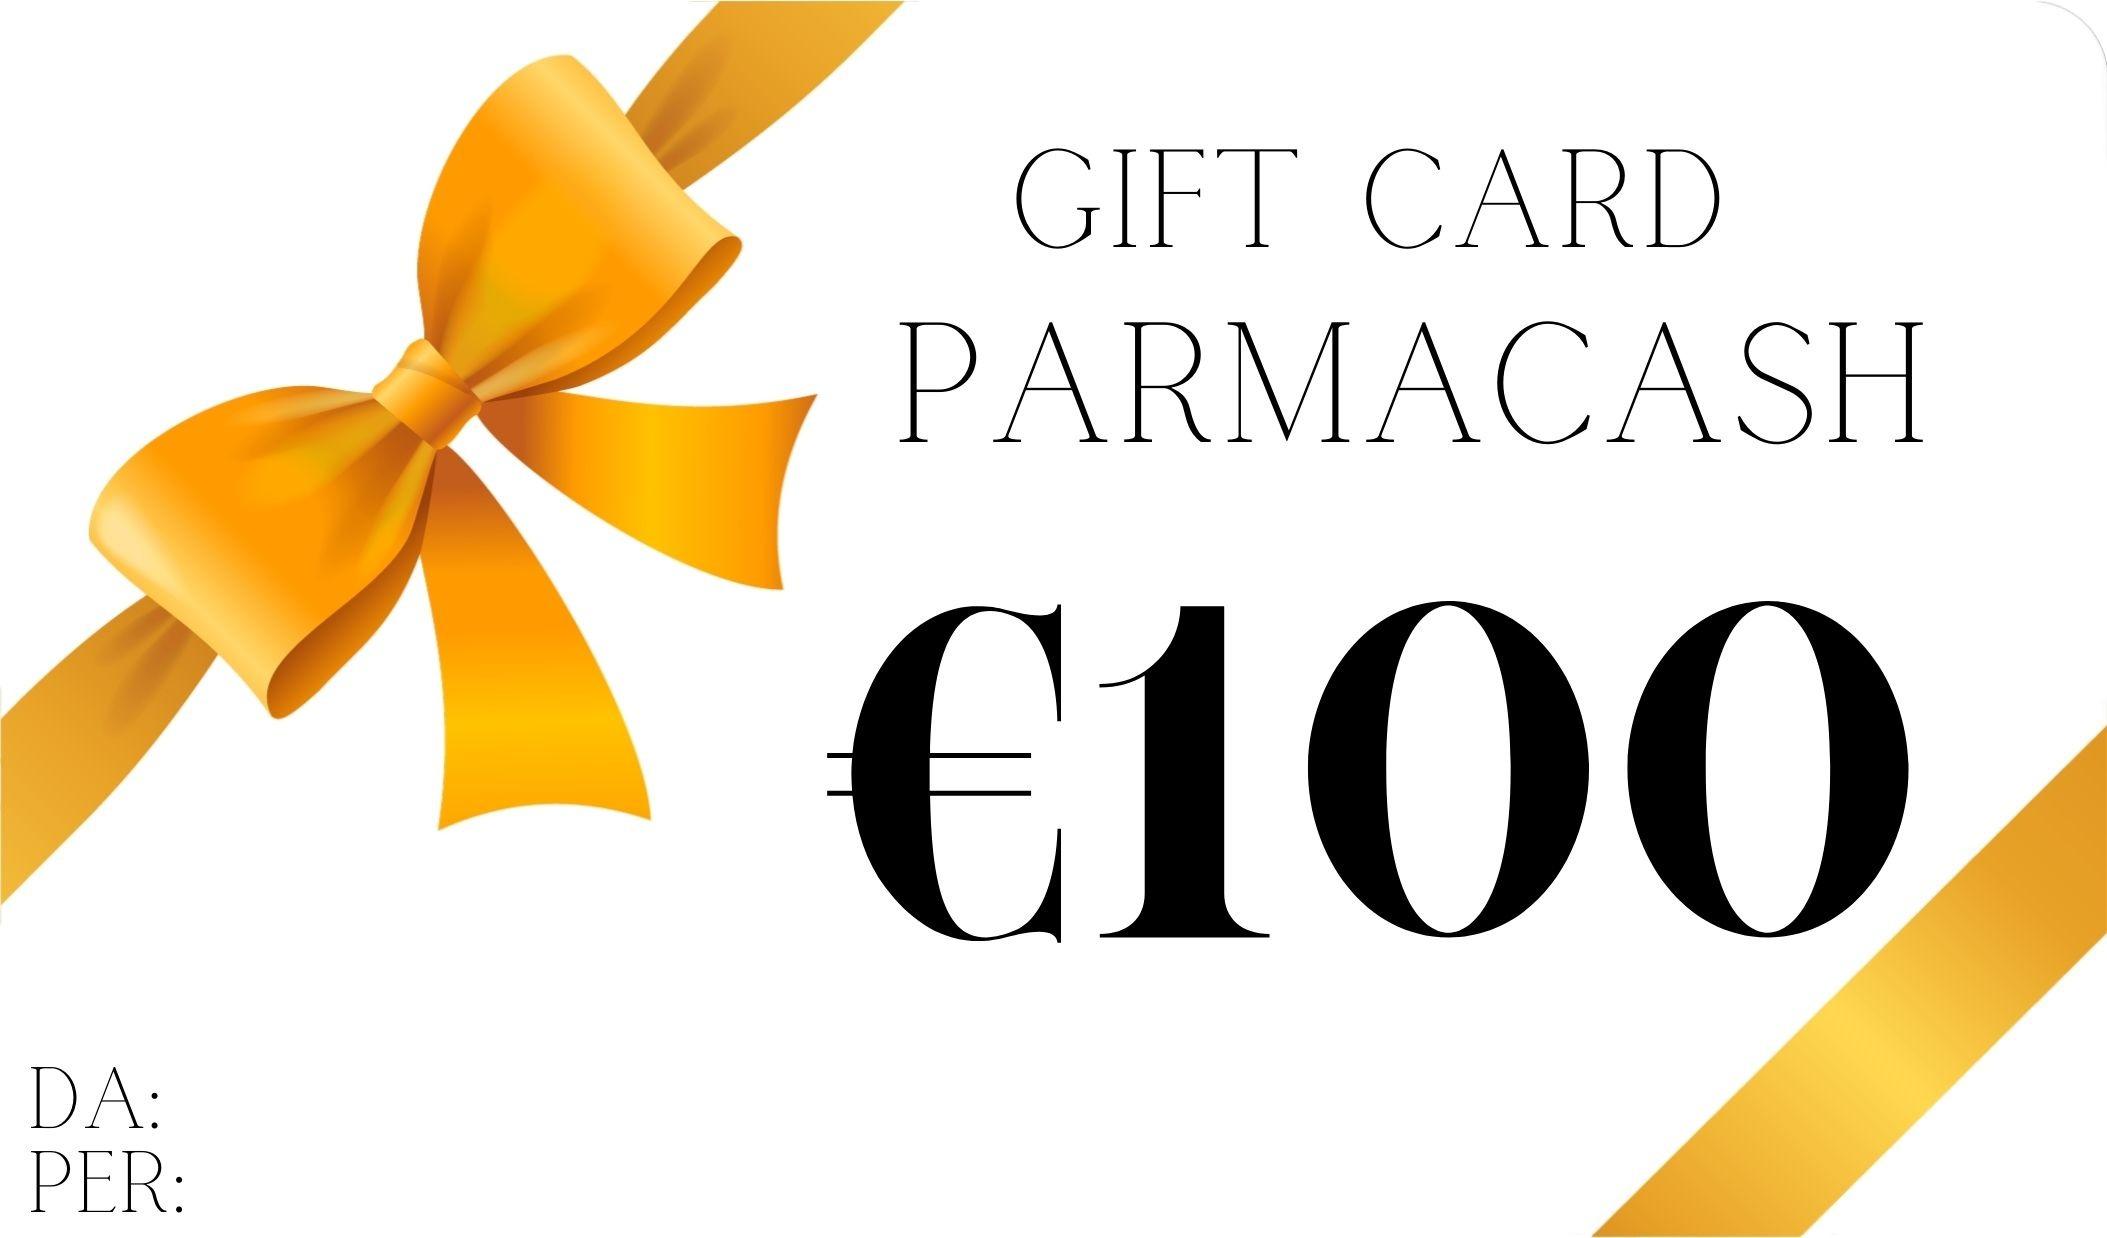 Le Gift Card di Parmacash